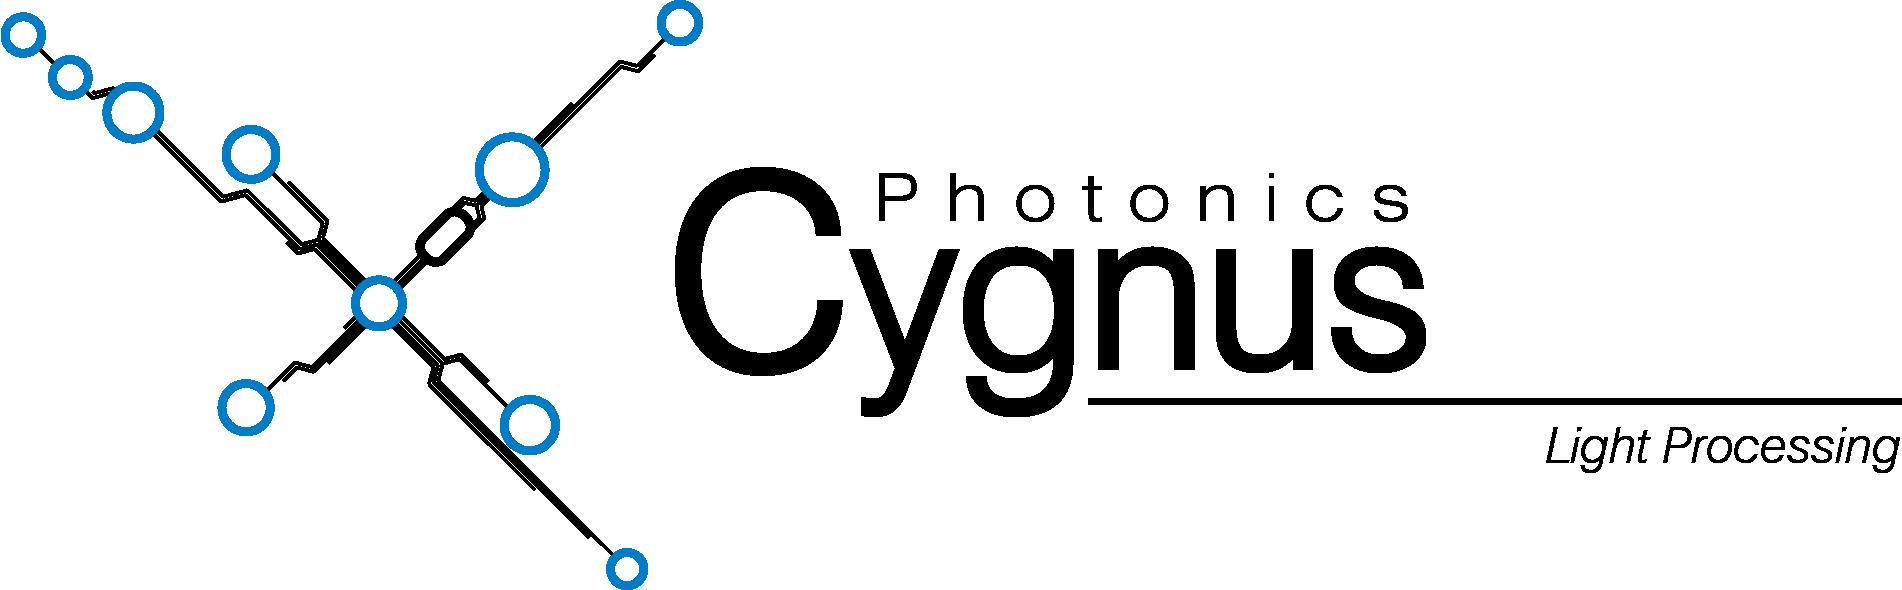 Cygnus Photonics, Inc.